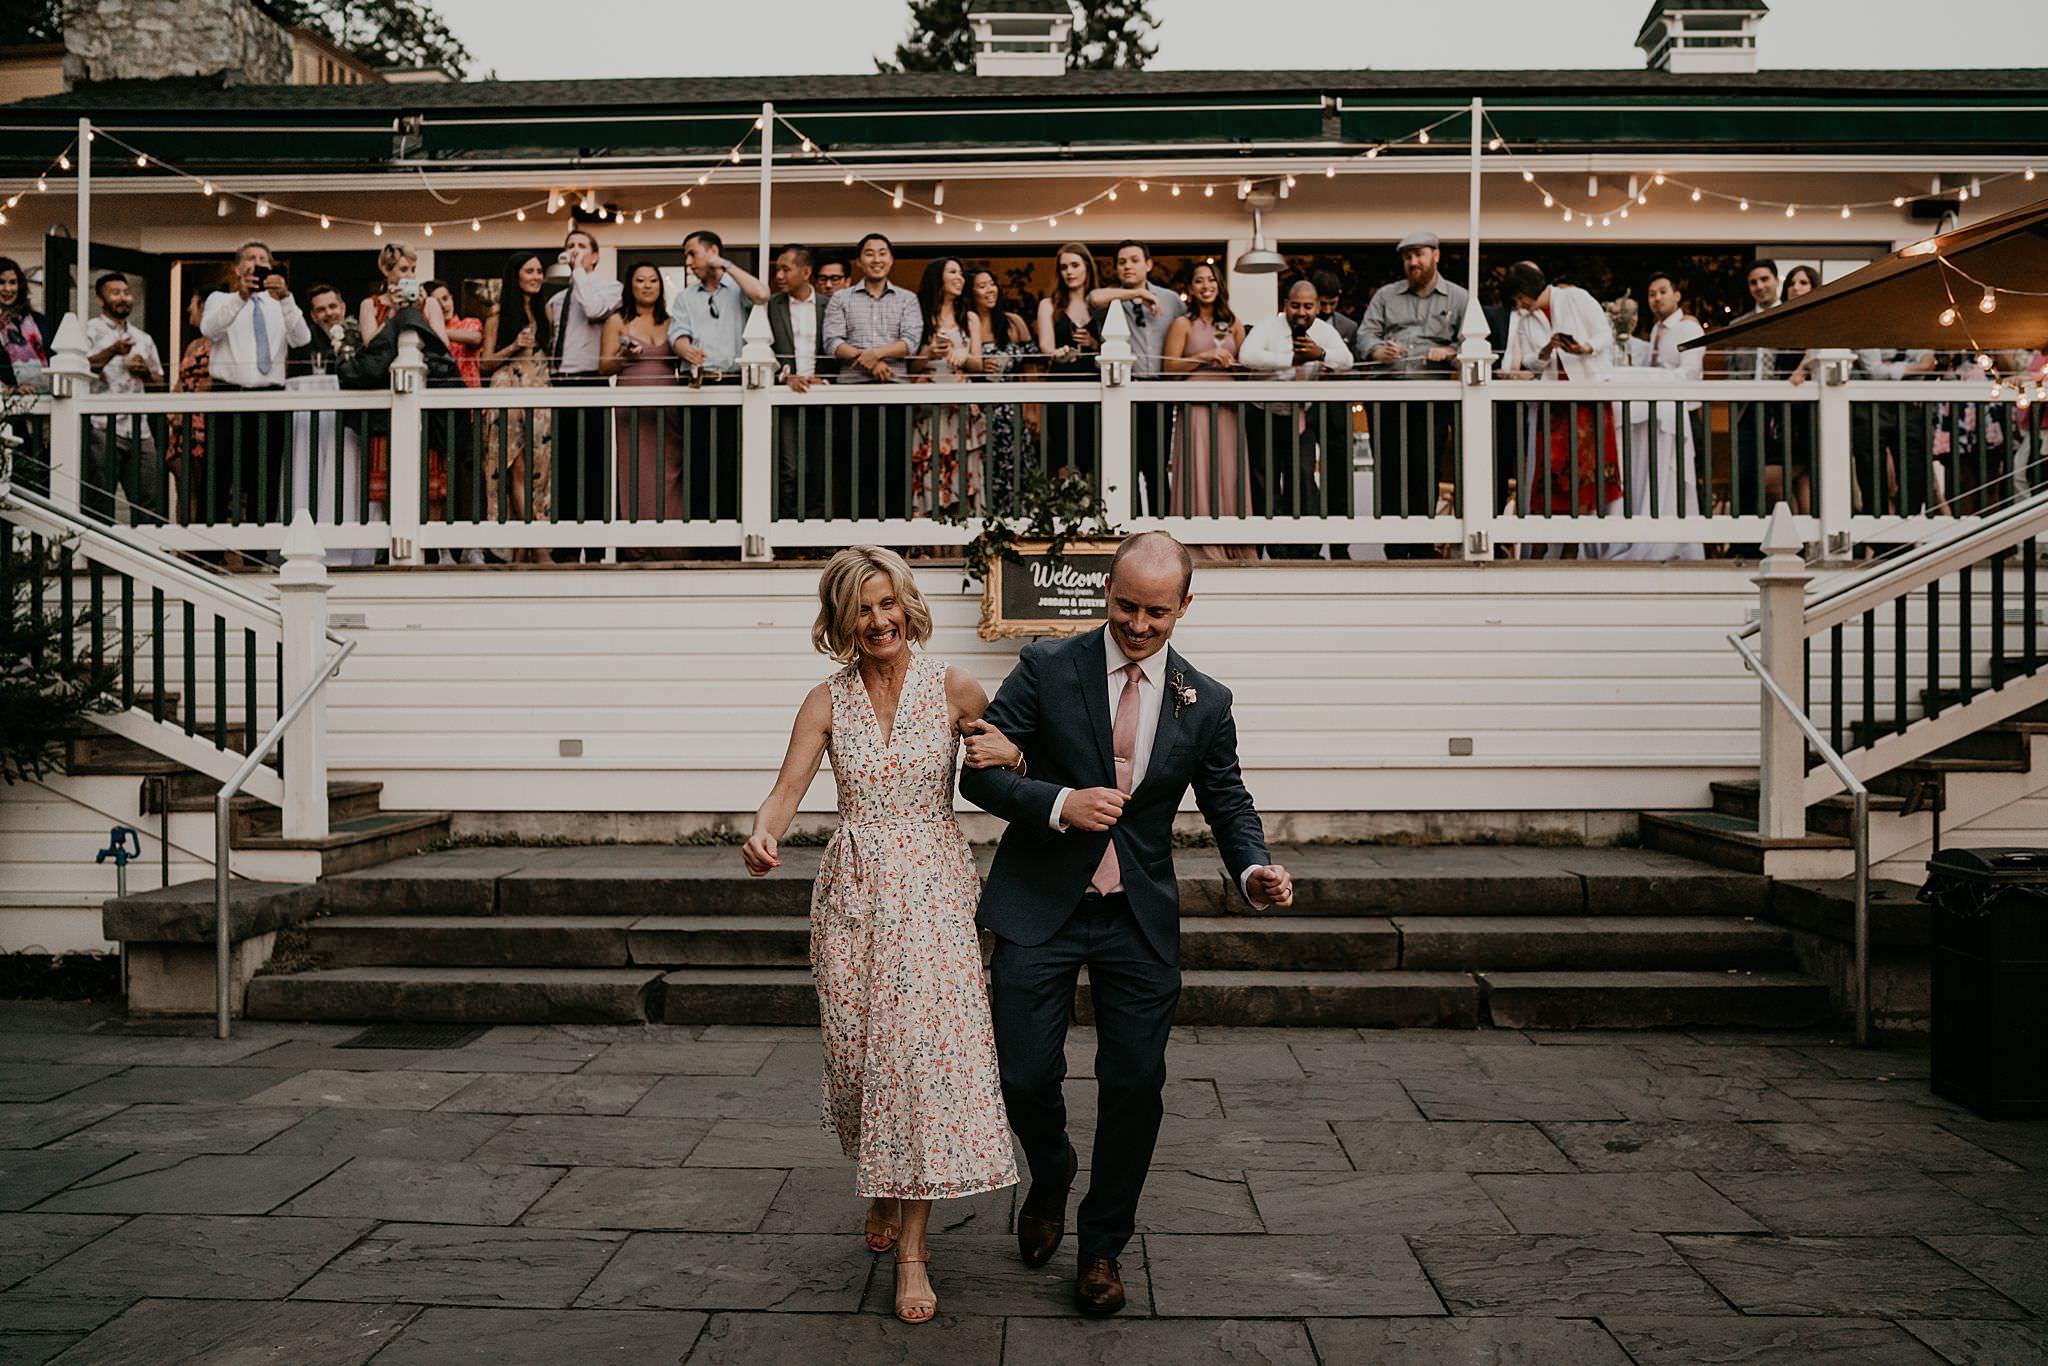 roche-harbor-wedding-san-juans-island-washington_0190.jpg